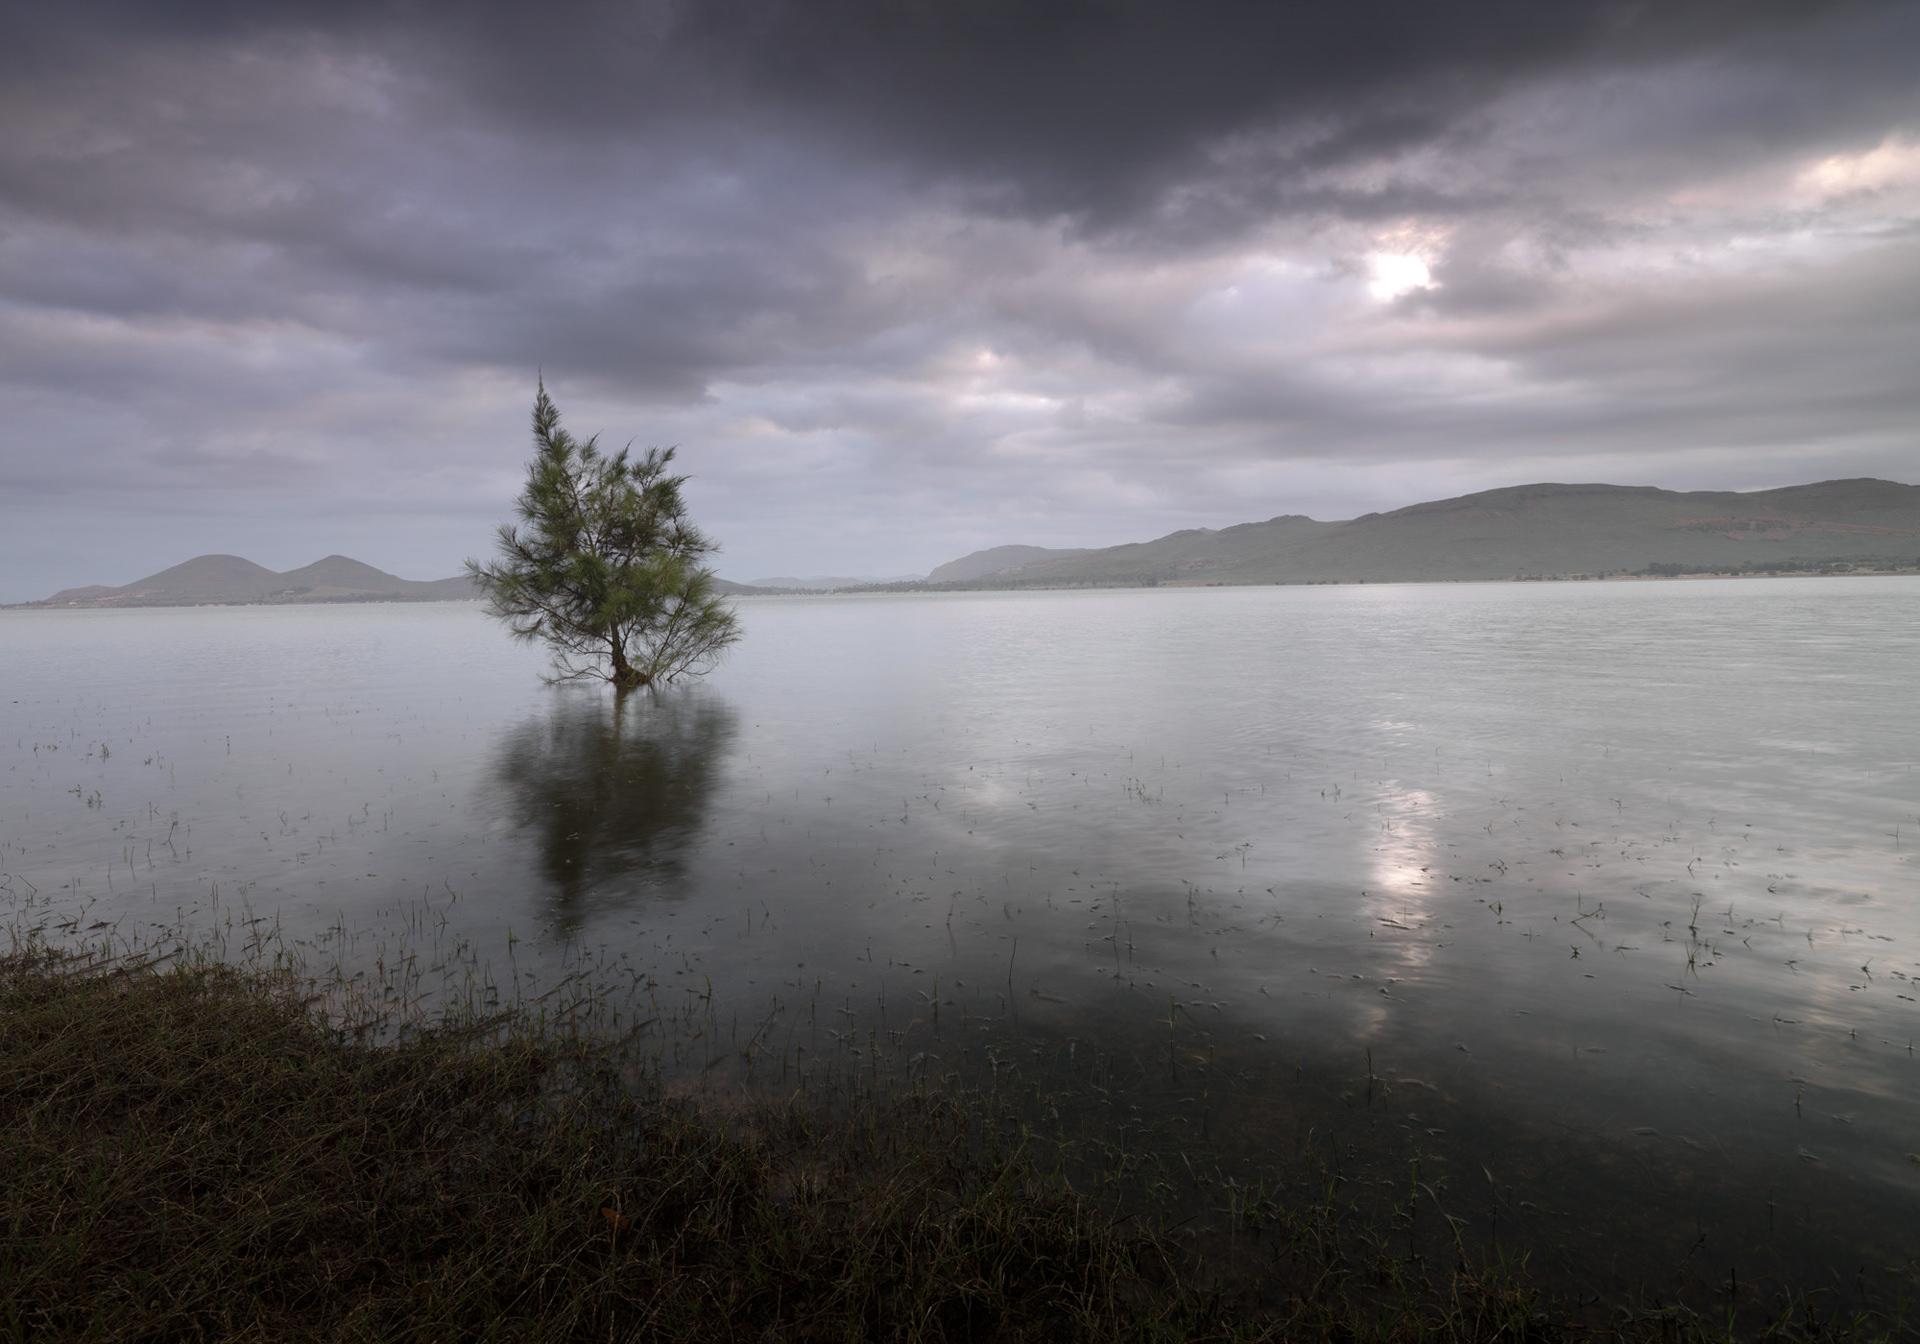 HG 0010, landscape, sea, tree, personal work, www.ankeluckmann.com, anke luckmann,